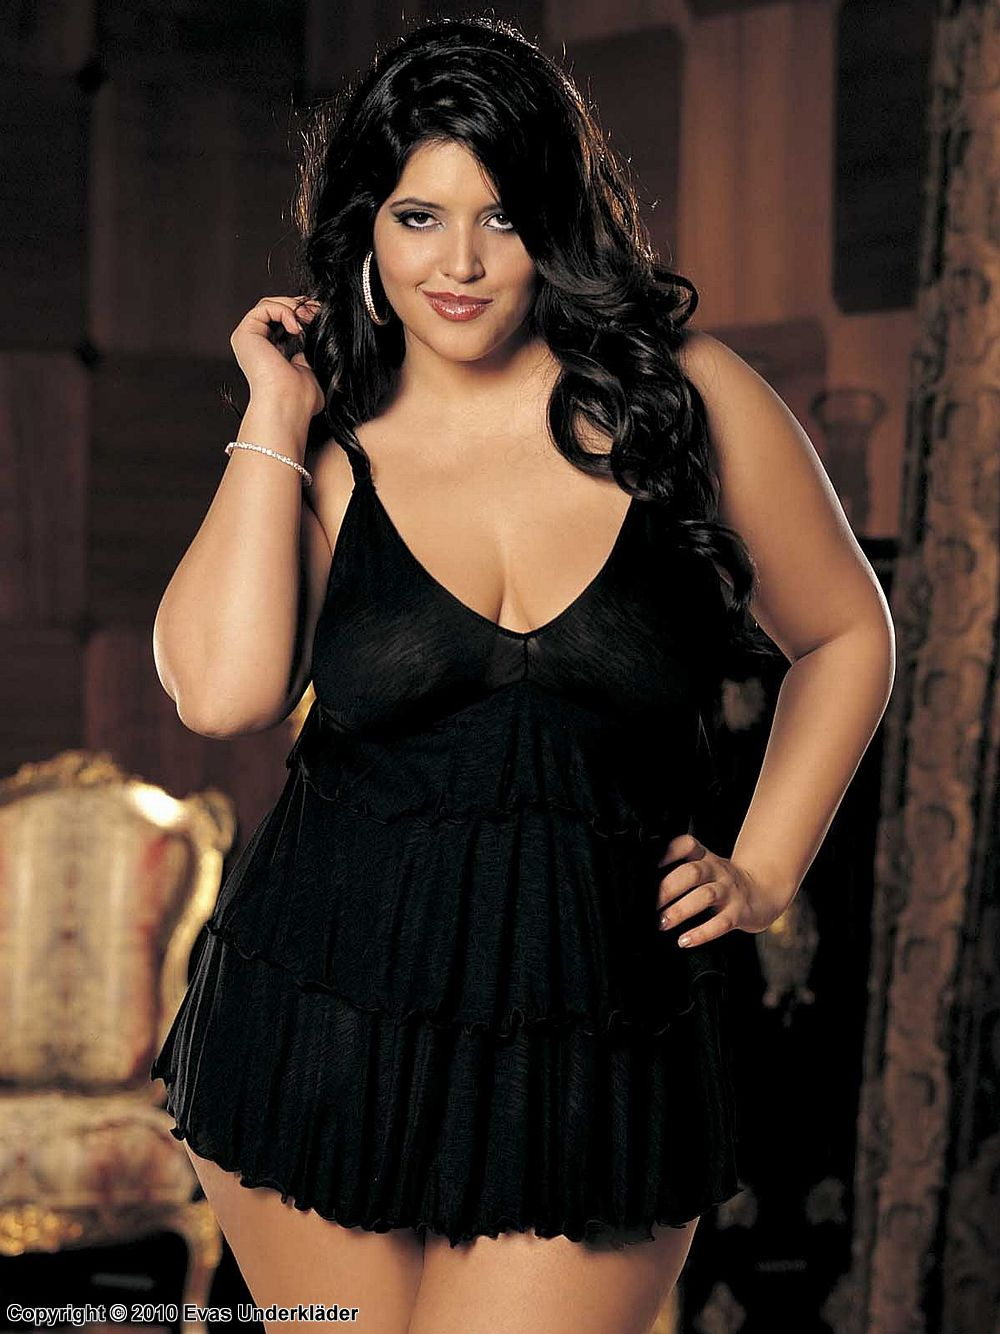 Sexy plus size models denise